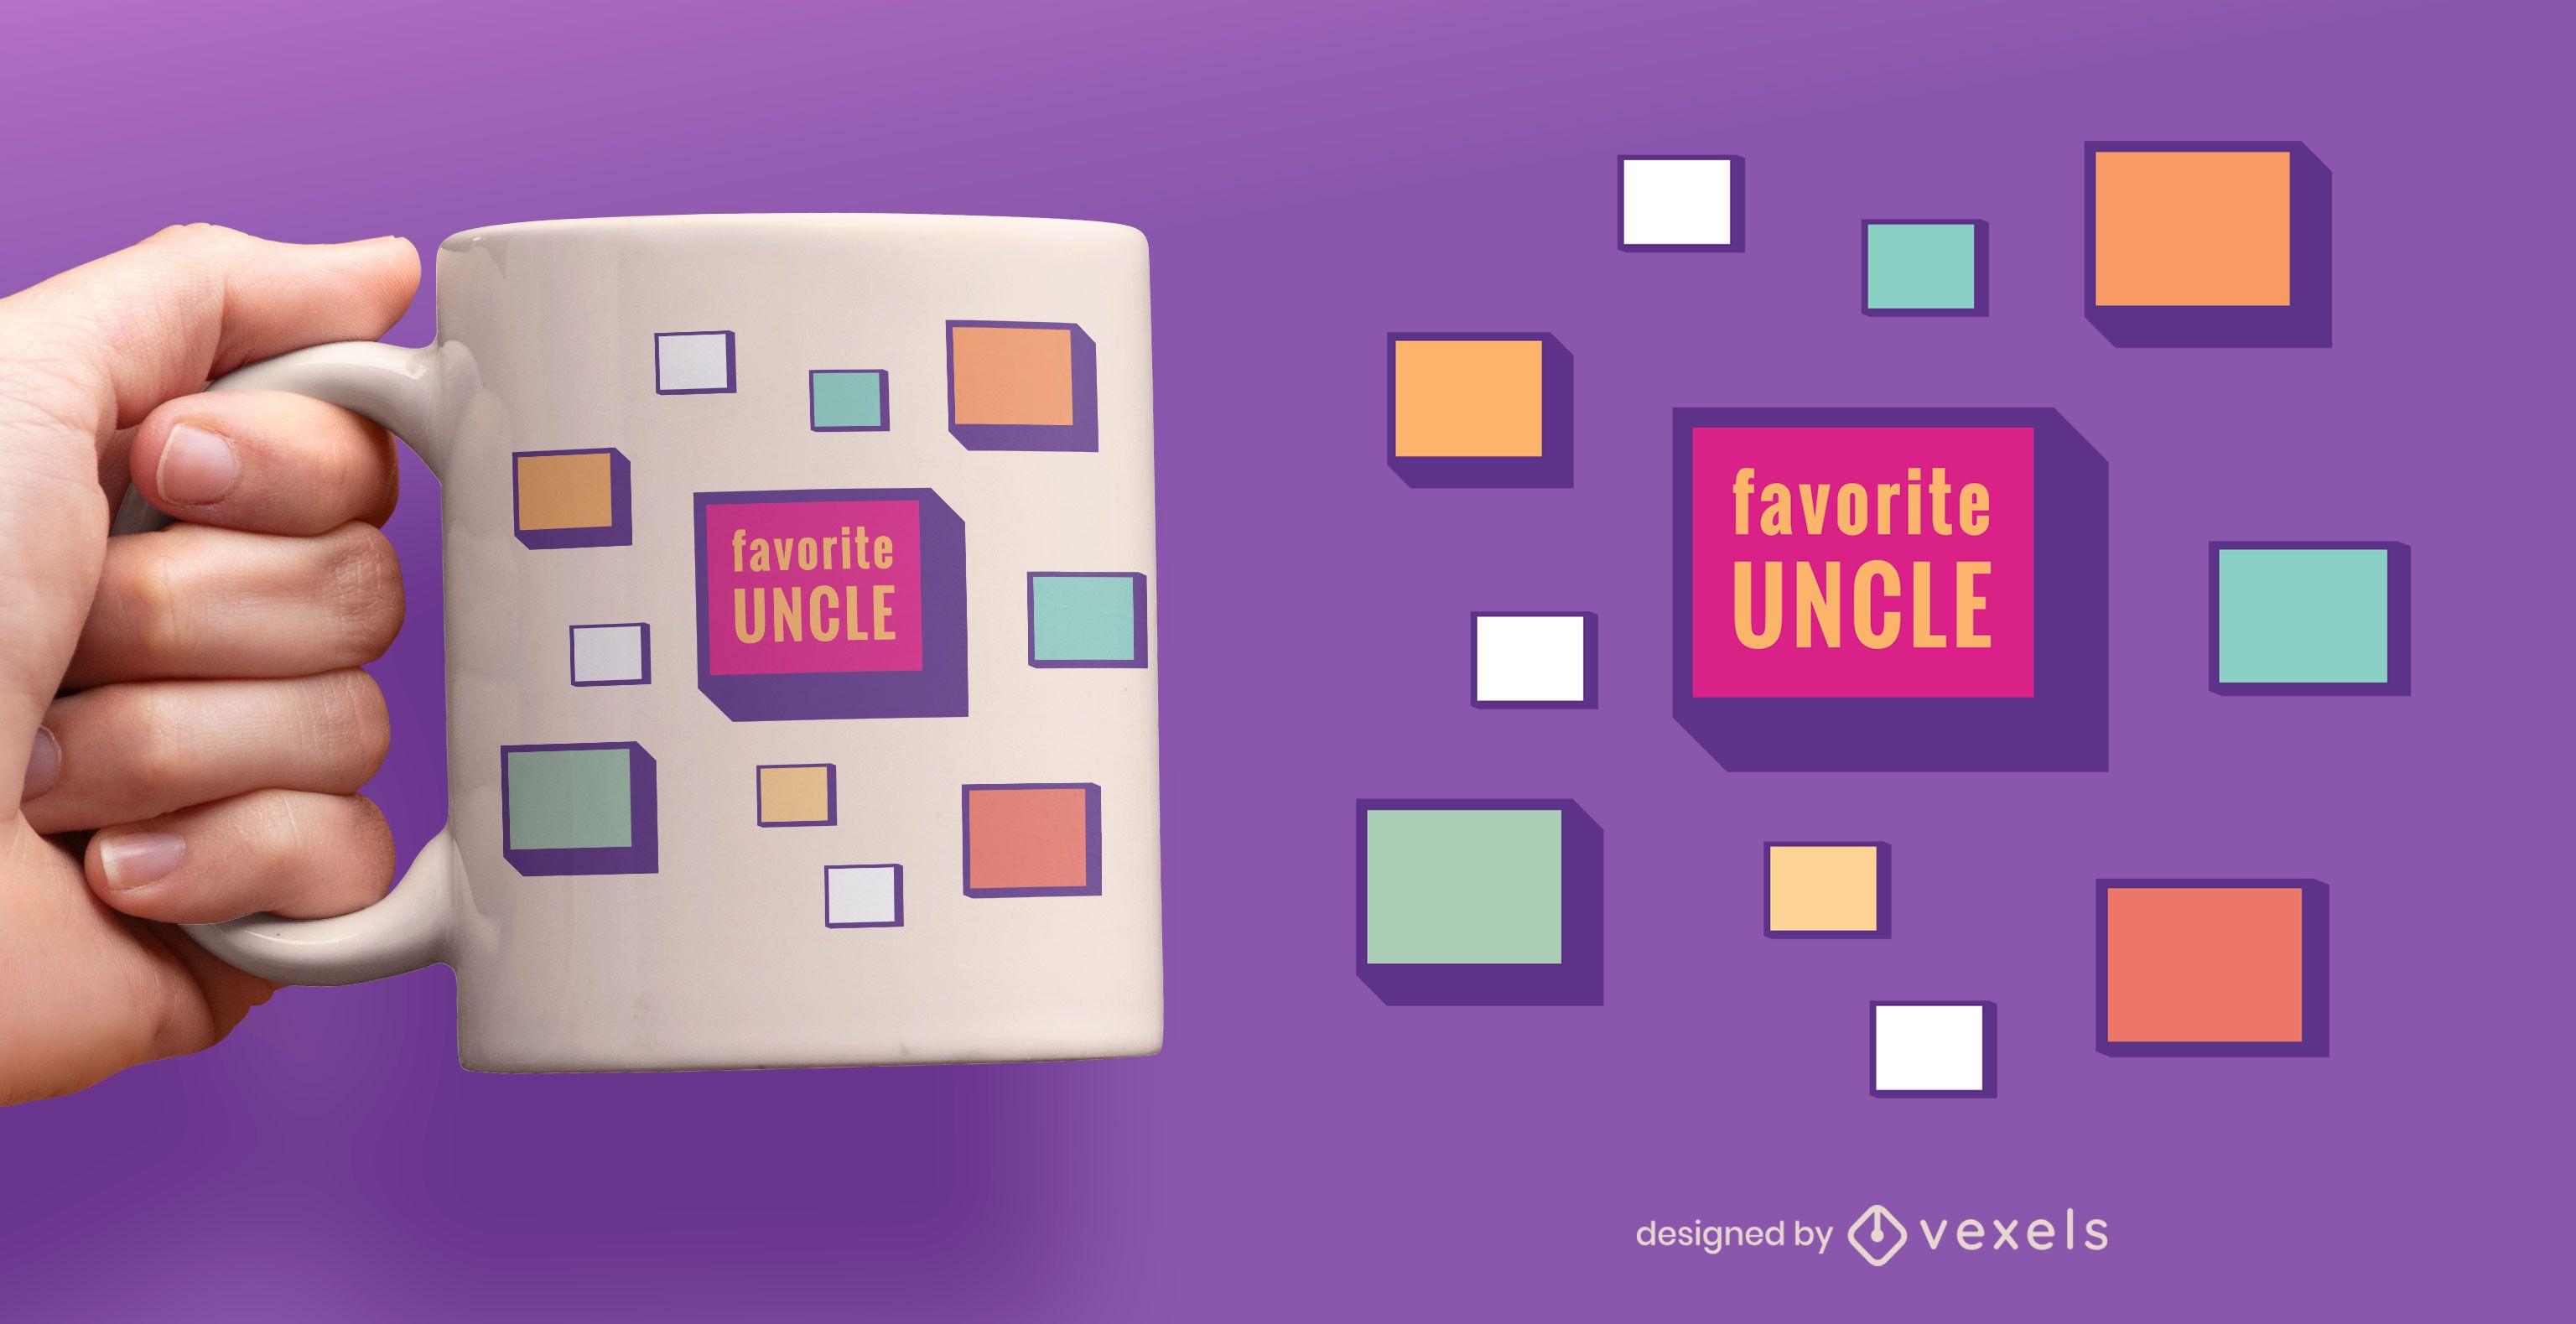 Favorite uncle flat mug design